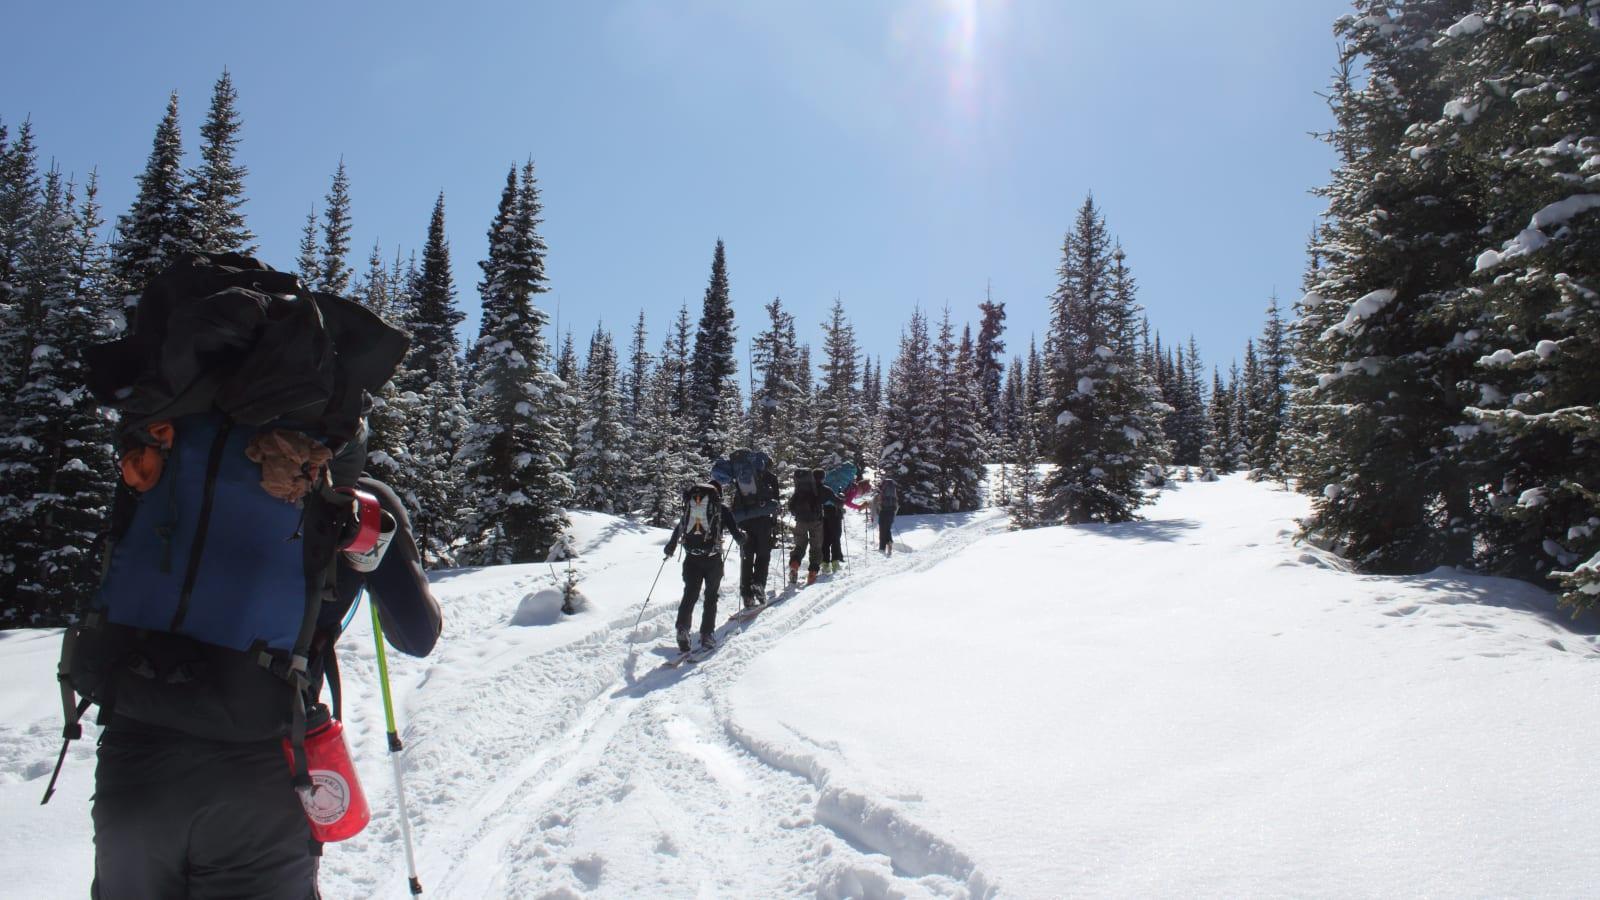 Colorado Peter Estin Hut Trip Basalt